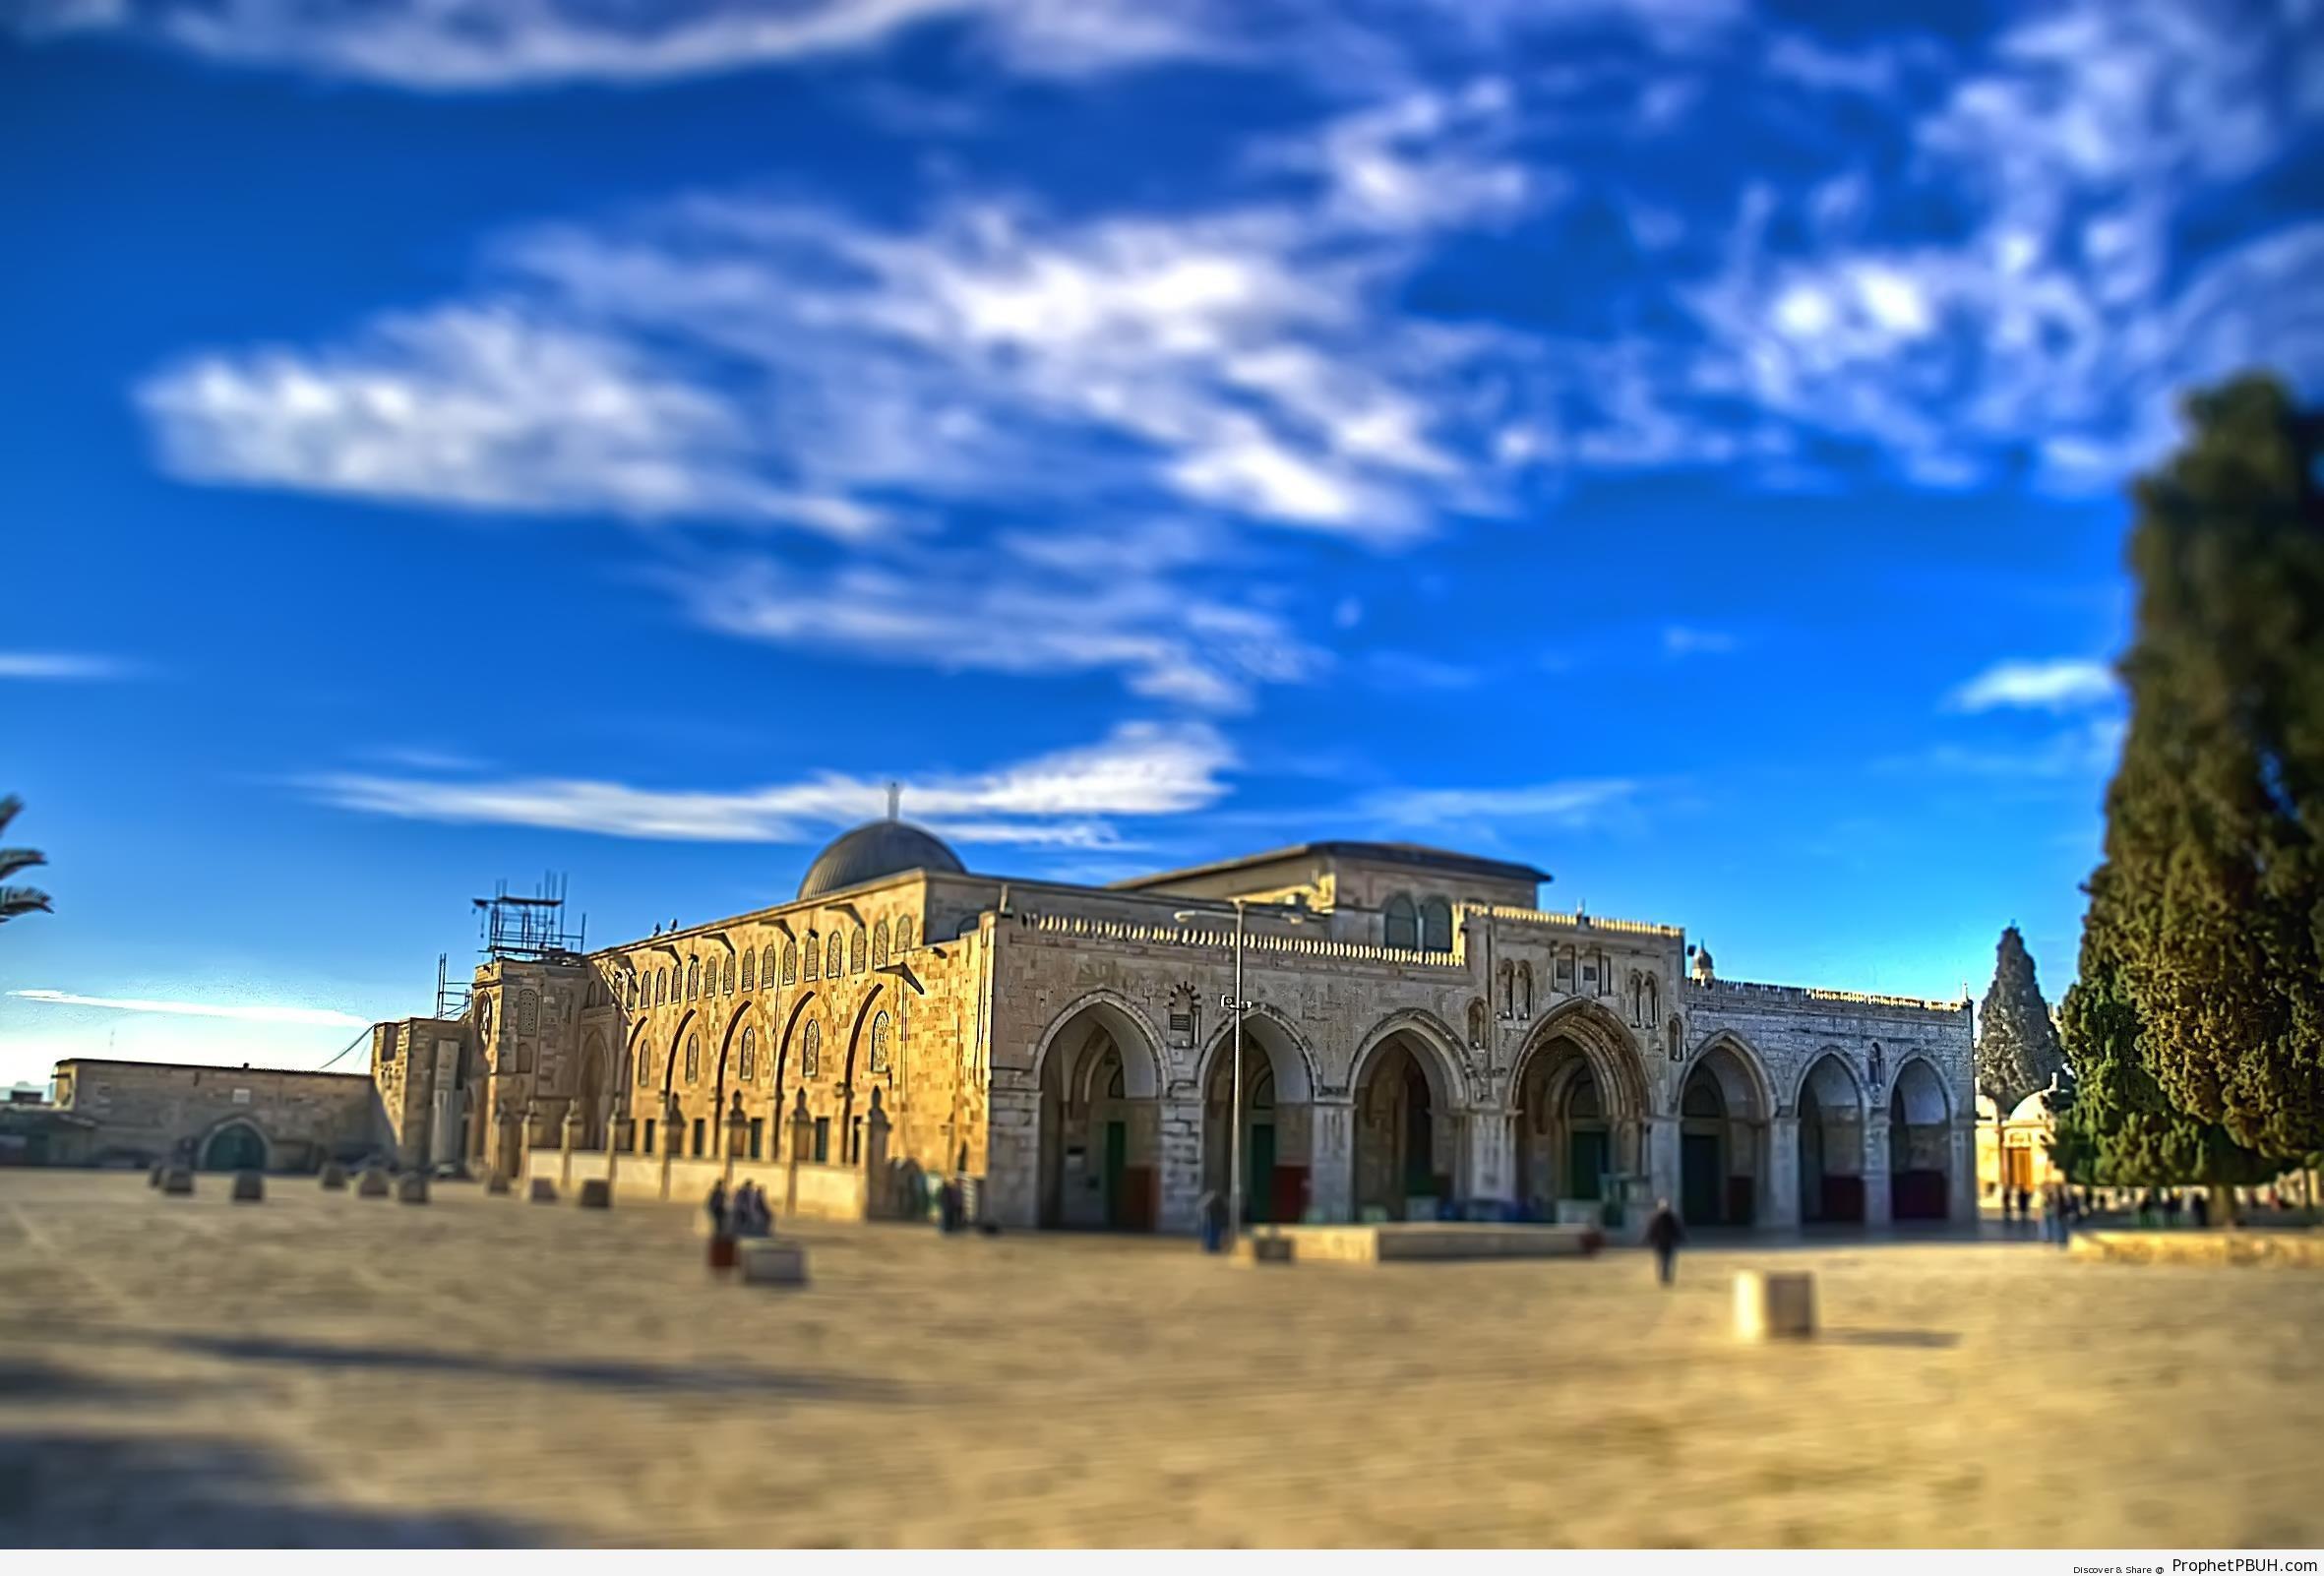 HDR Shot of Al-Aqsa Mosque (Bayt al-Muqaddas) in Jerusalem, Palestine - Al-Aqsa Mosque (Bayt al-Muqaddas) in Jerusalem, Palestine -Picture